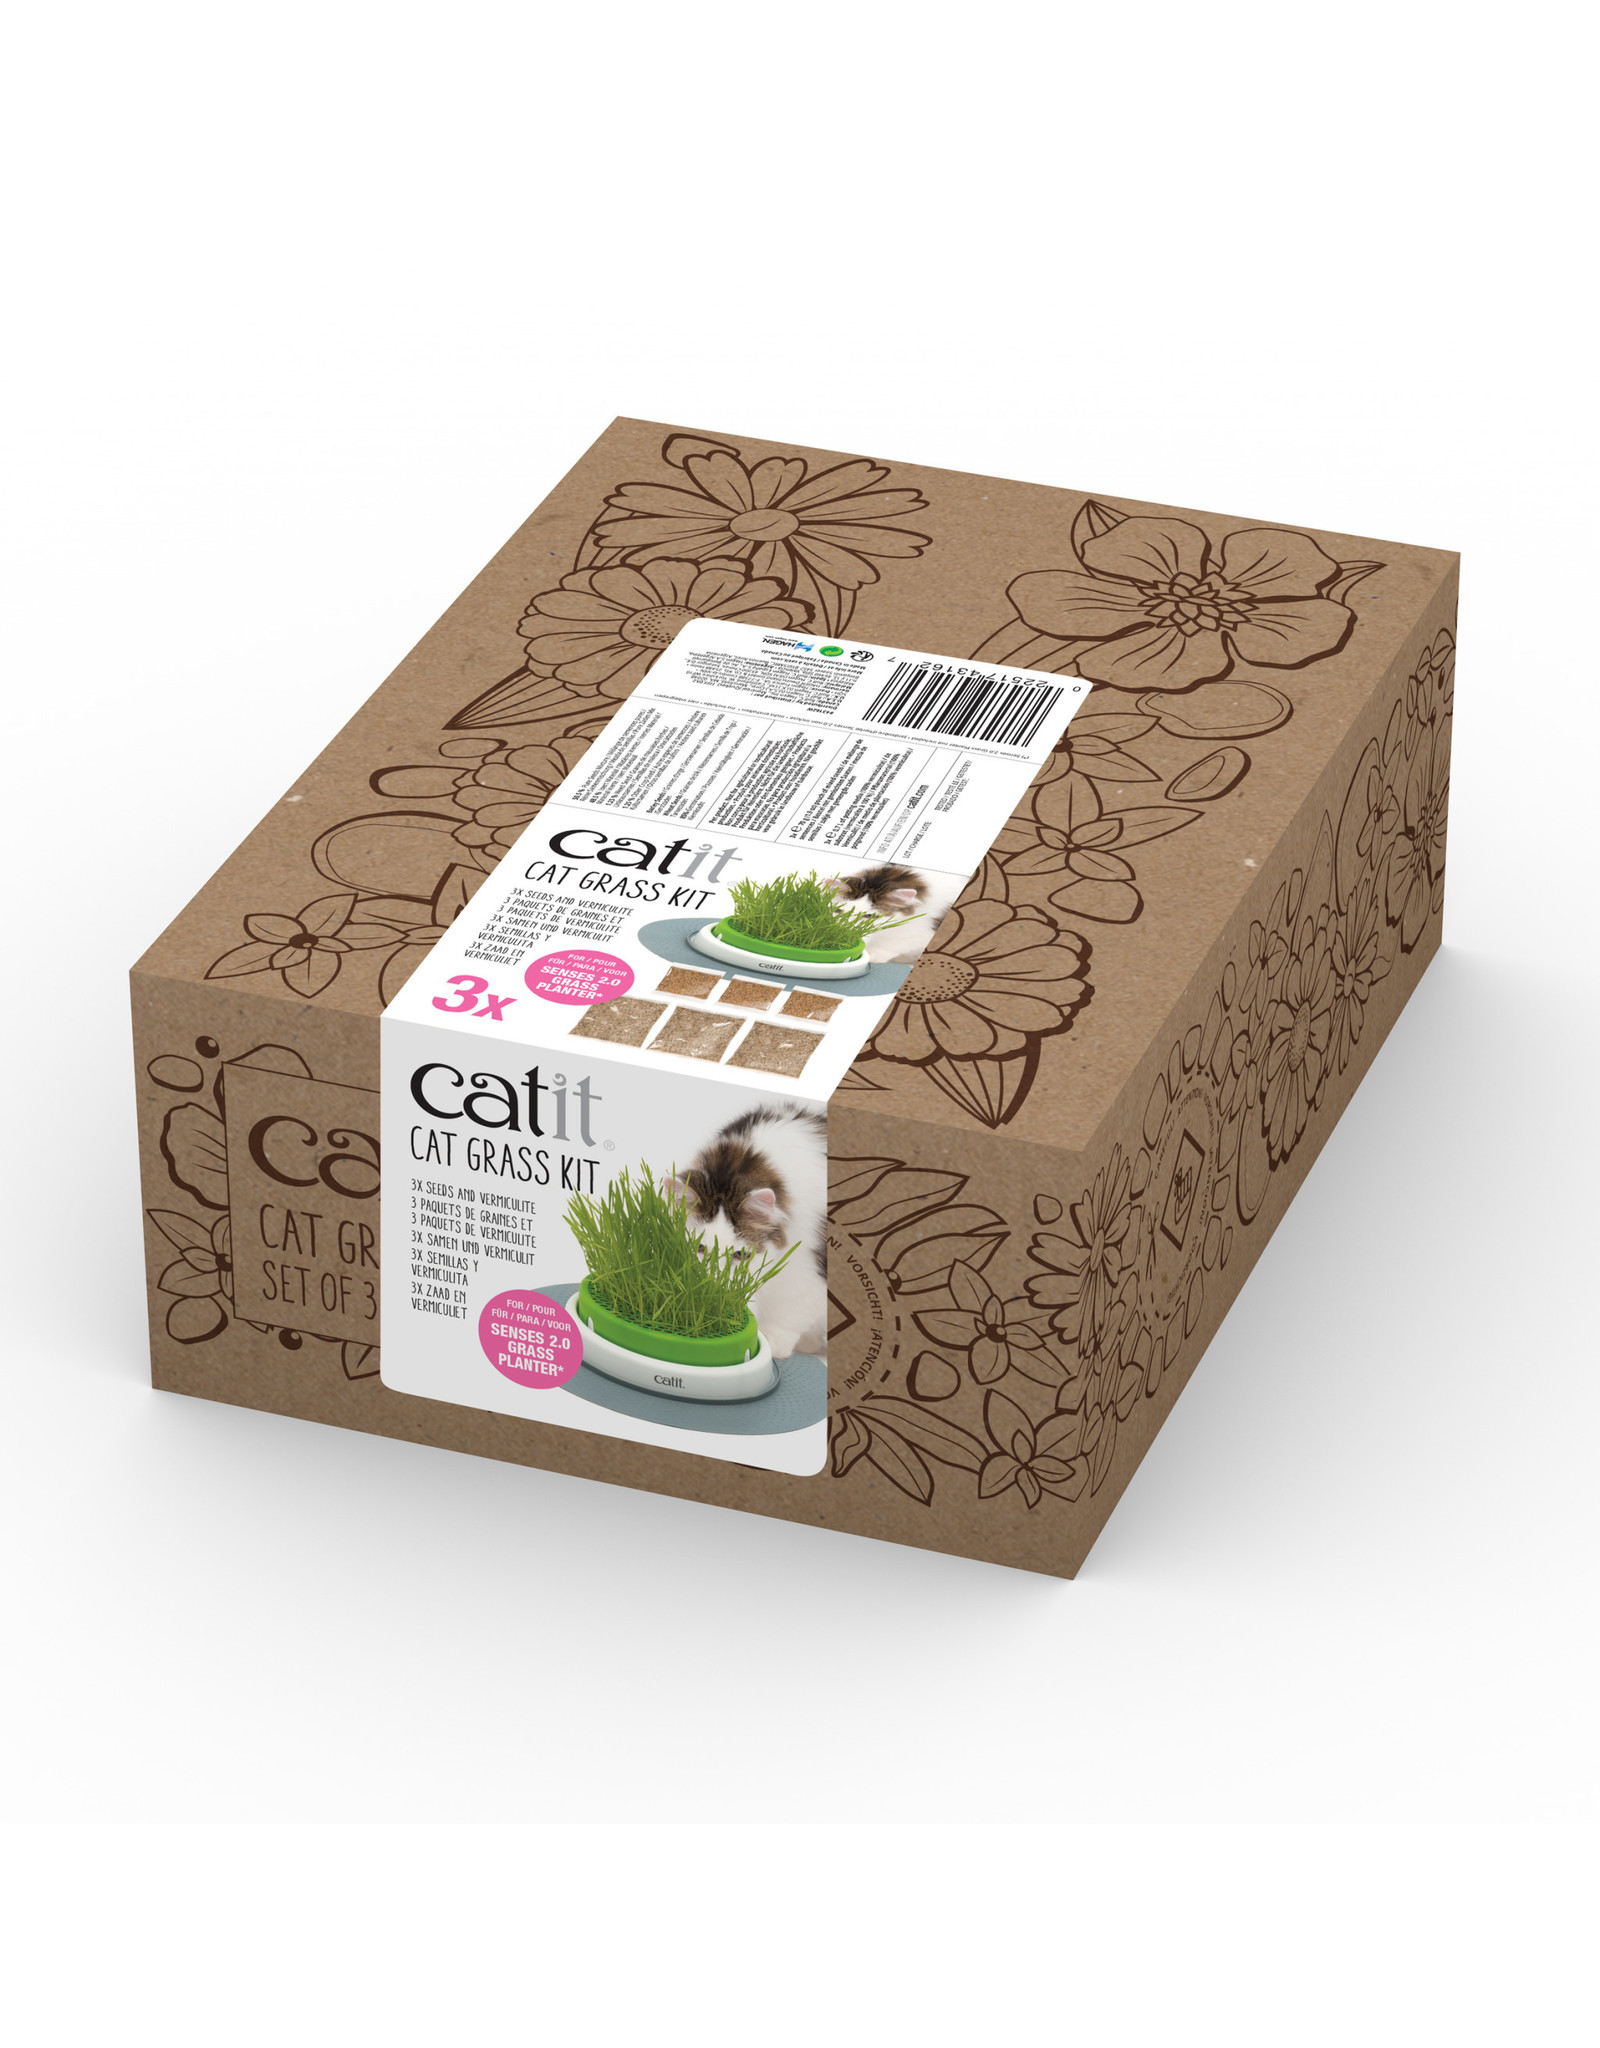 CatIt Senses 2.0 Cat Grass Kit 3 Pack